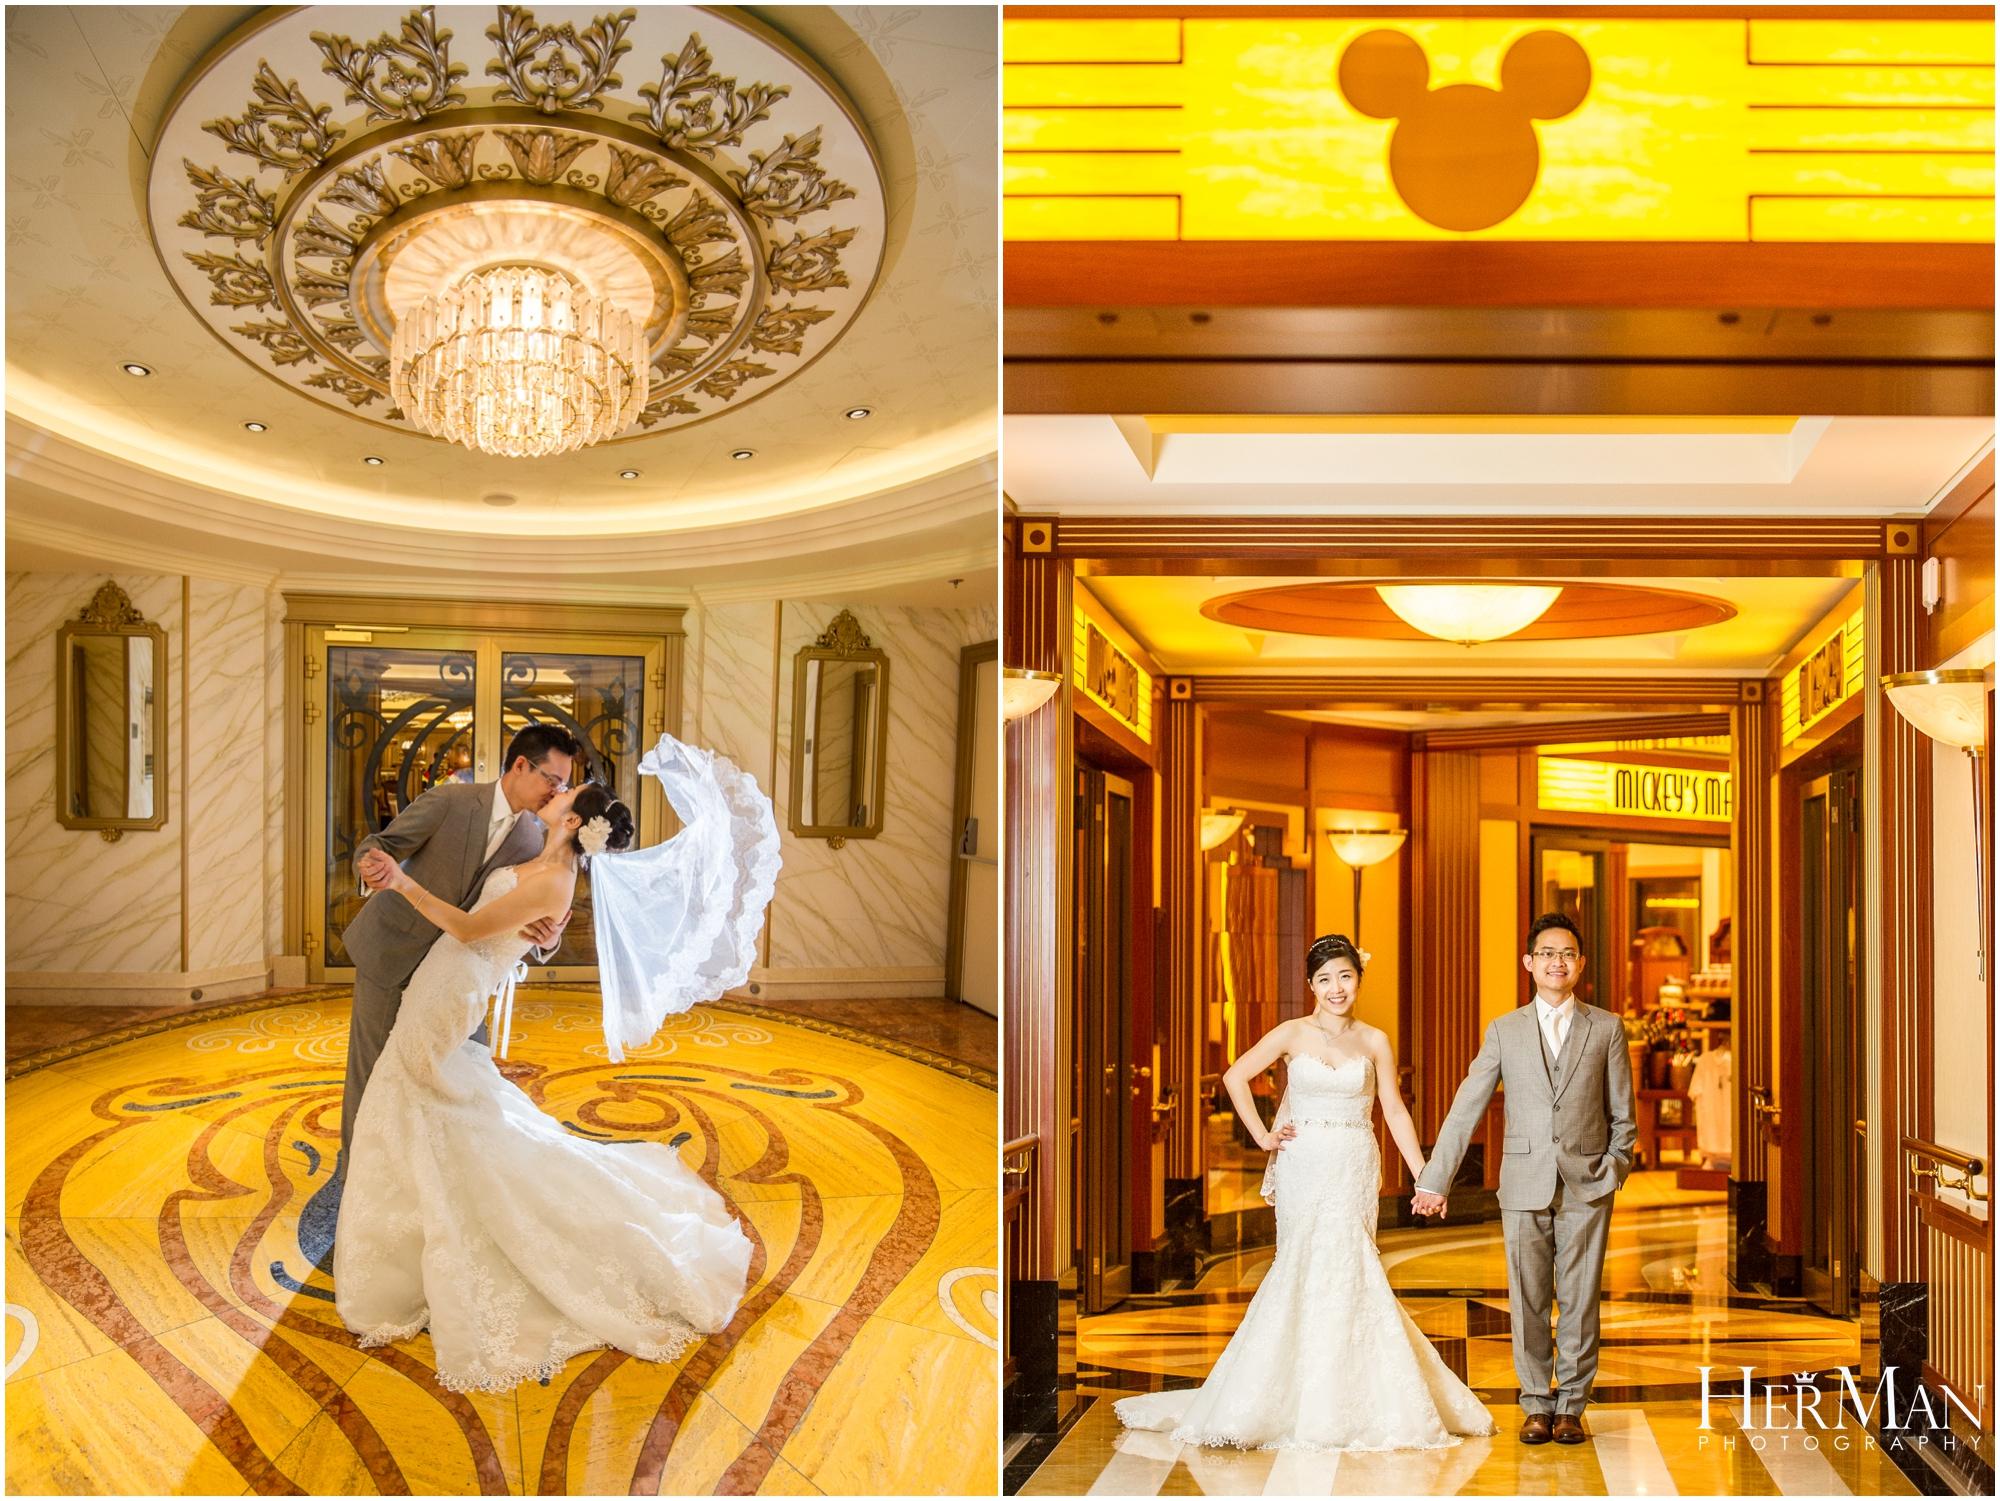 disney-fantasy-cruise-wedding-HerMan-photography_0037.jpg